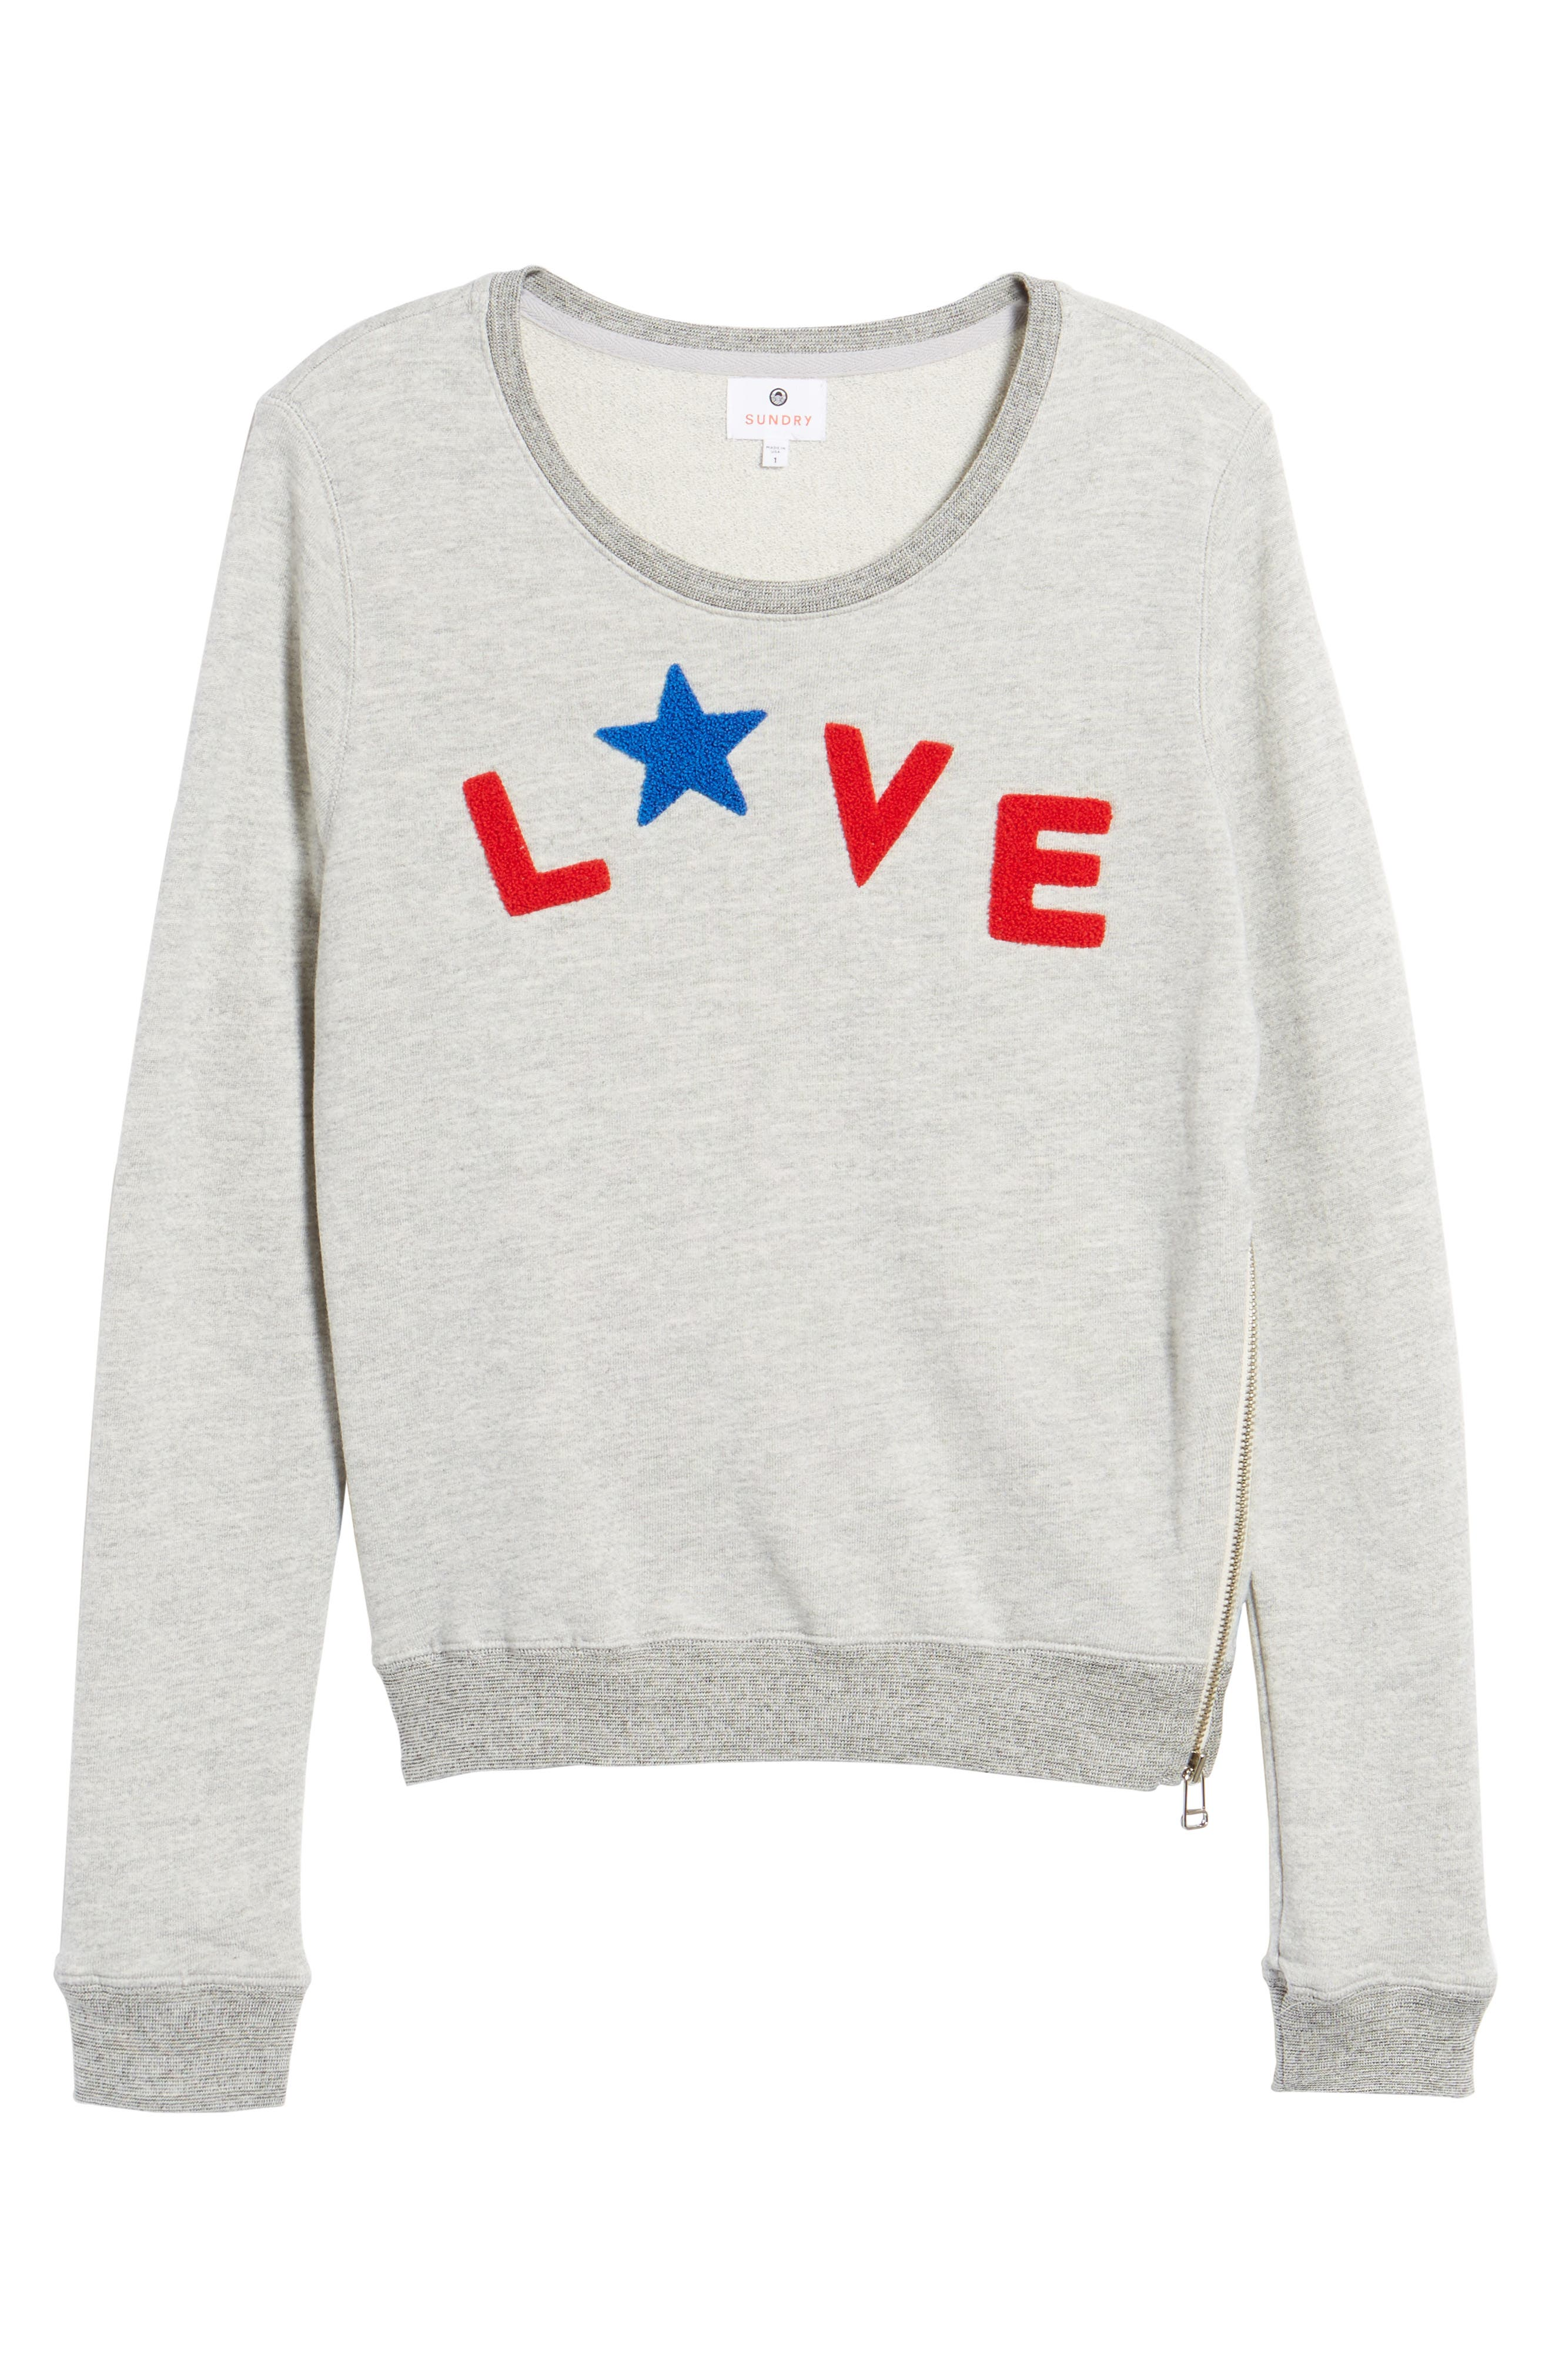 Love Sweatshirt,                             Alternate thumbnail 6, color,                             039